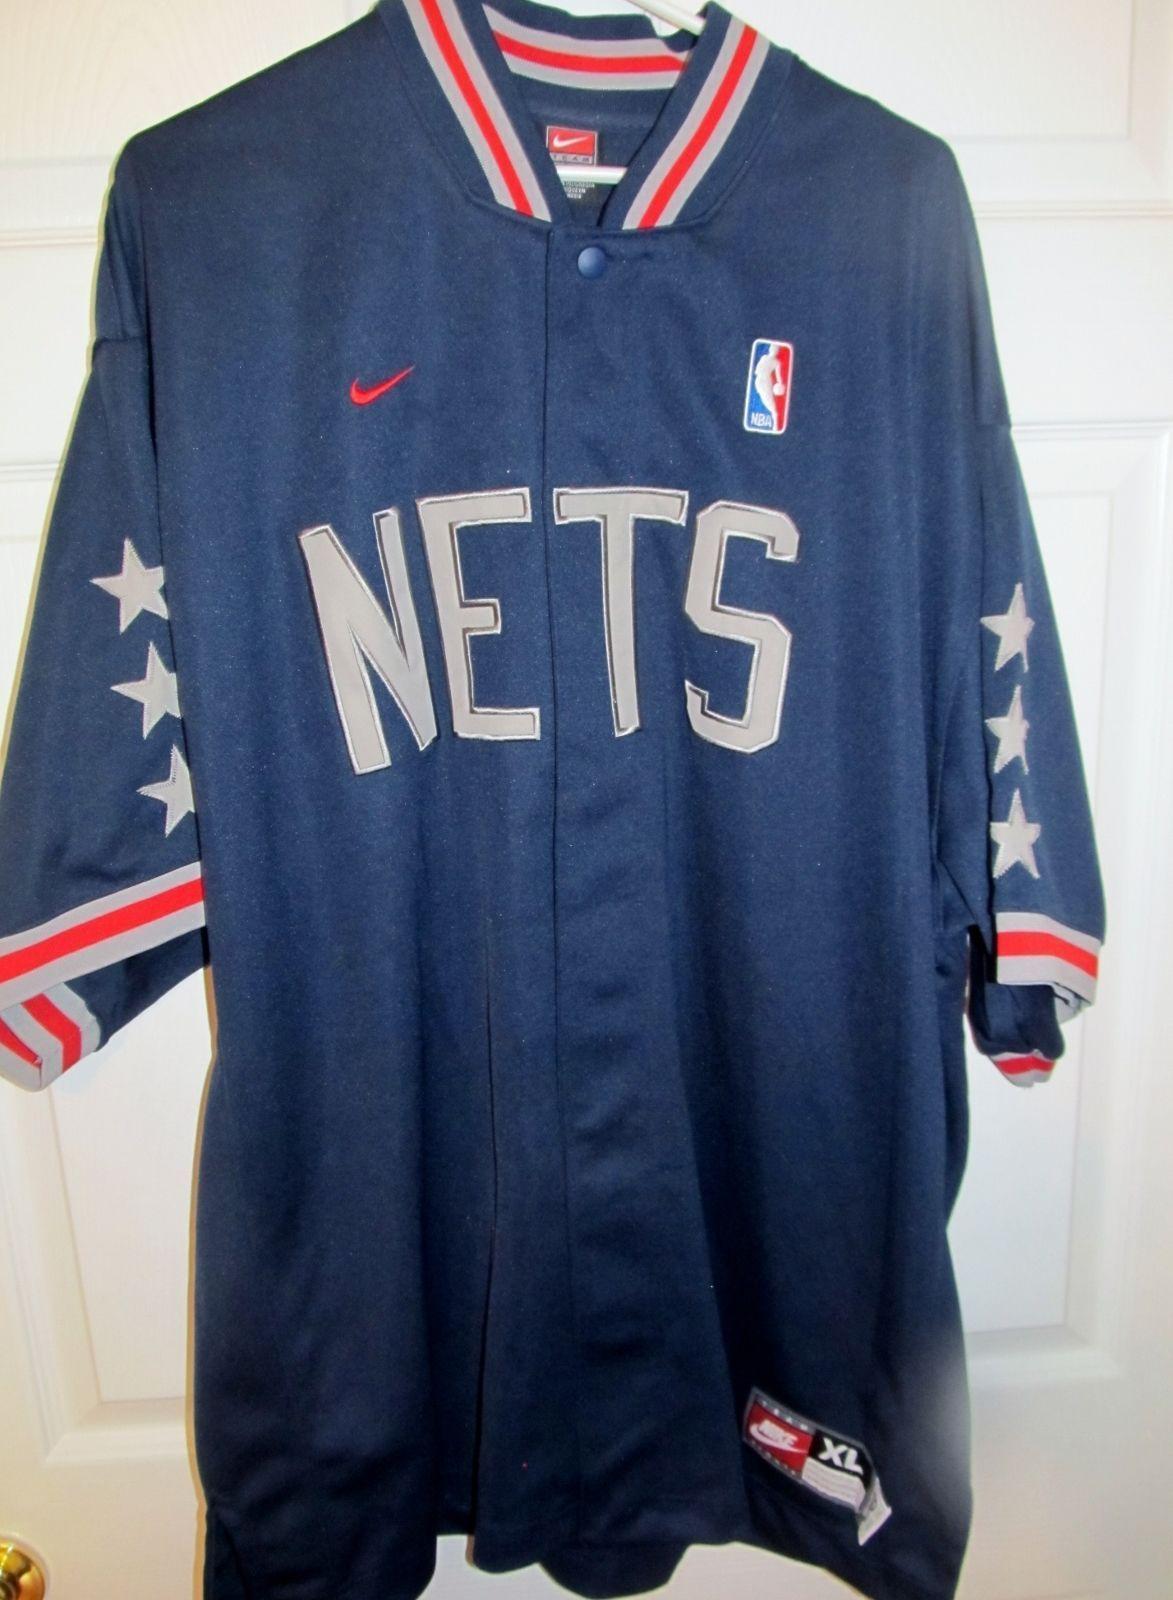 Brooklyn NJ Nets 1980 Throwback Retro NBA Warm-Up Jacket X-large -  Basketball-NBA cd8290a75